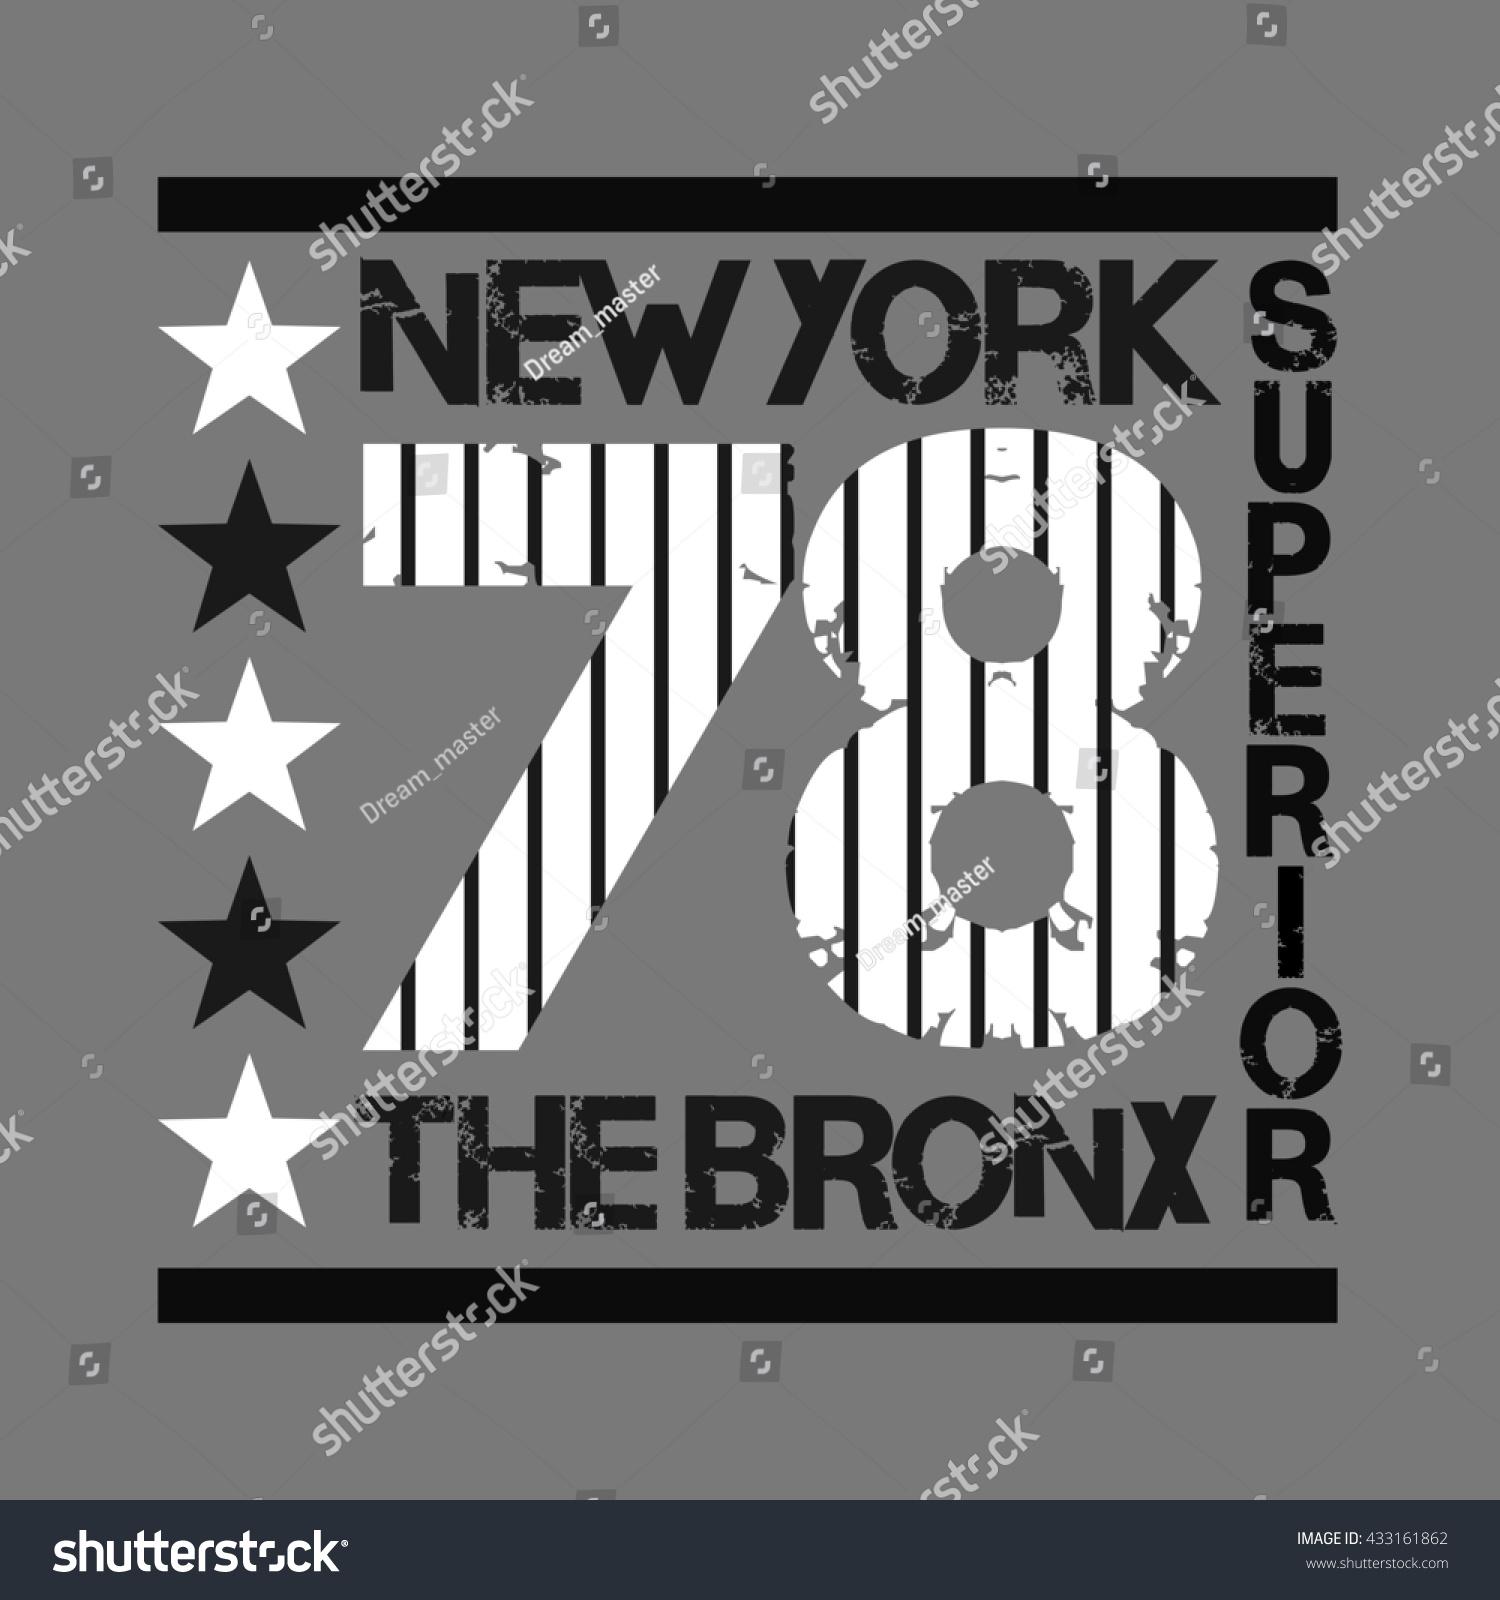 Design a t shirt nyc - New York Typography T Shirt Bronx Design Graphic Printing Man Nyc